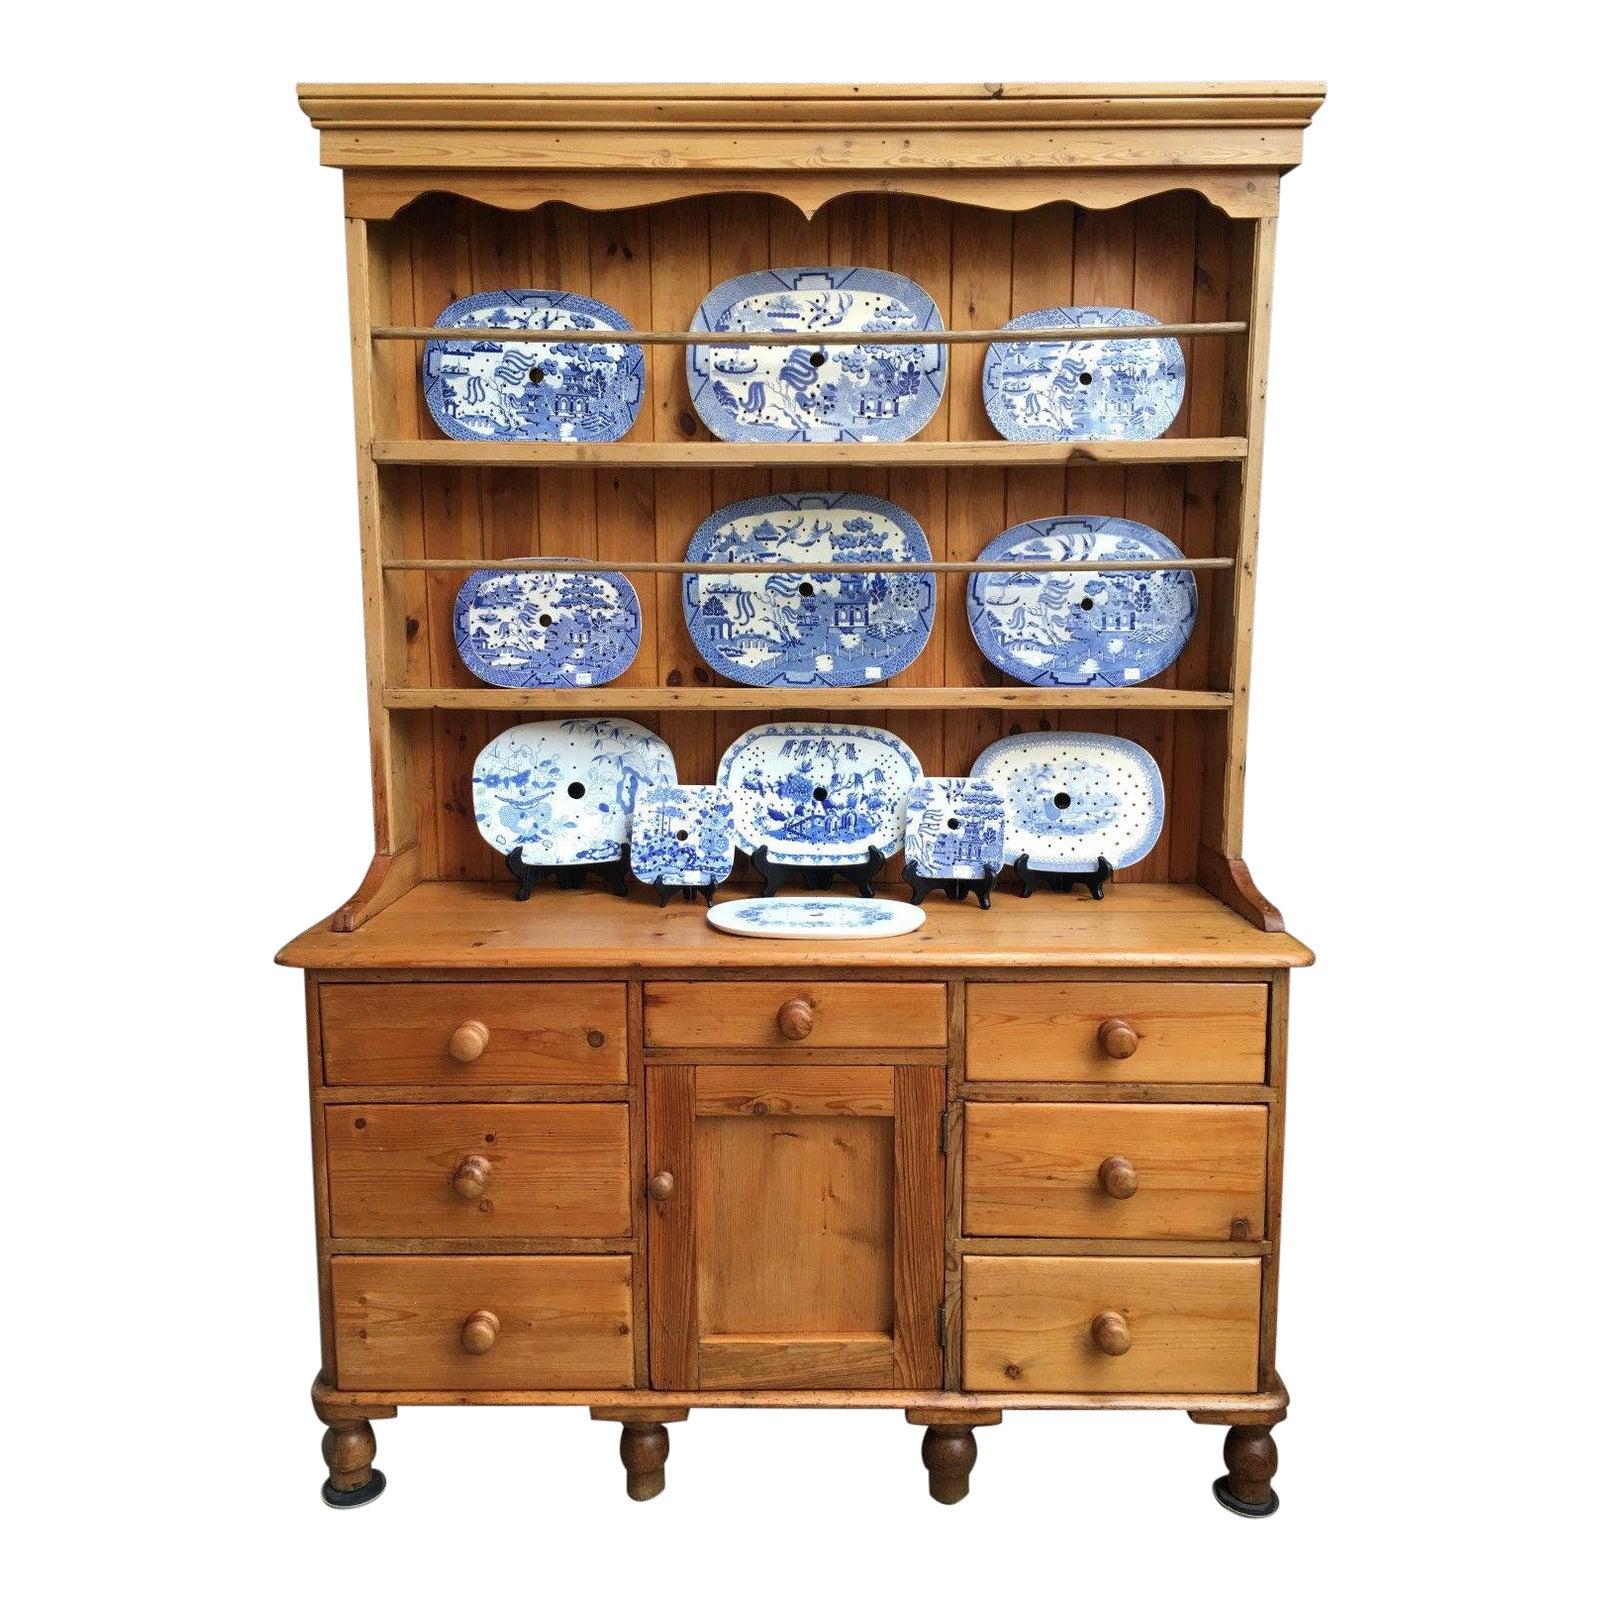 Antique English Pine Welsh Dresser Kitchen Hutch Sideboard Farmhouse  Cupboard